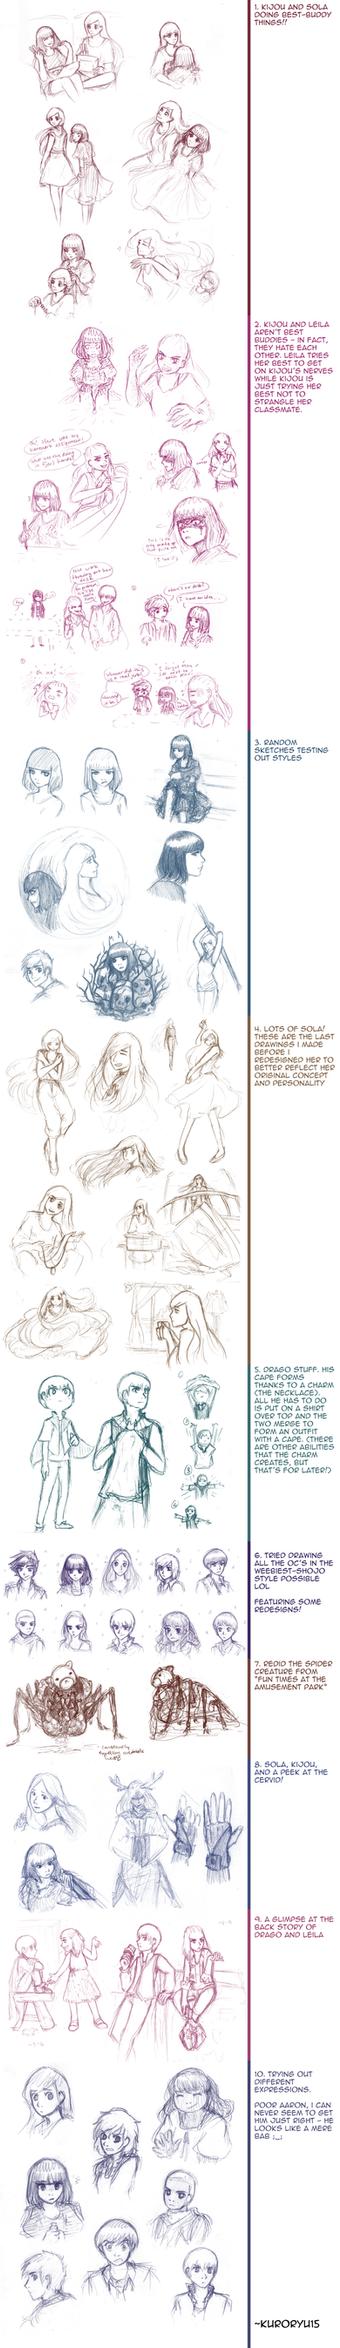 OC Sketch Dump 6 by KuroRyu15